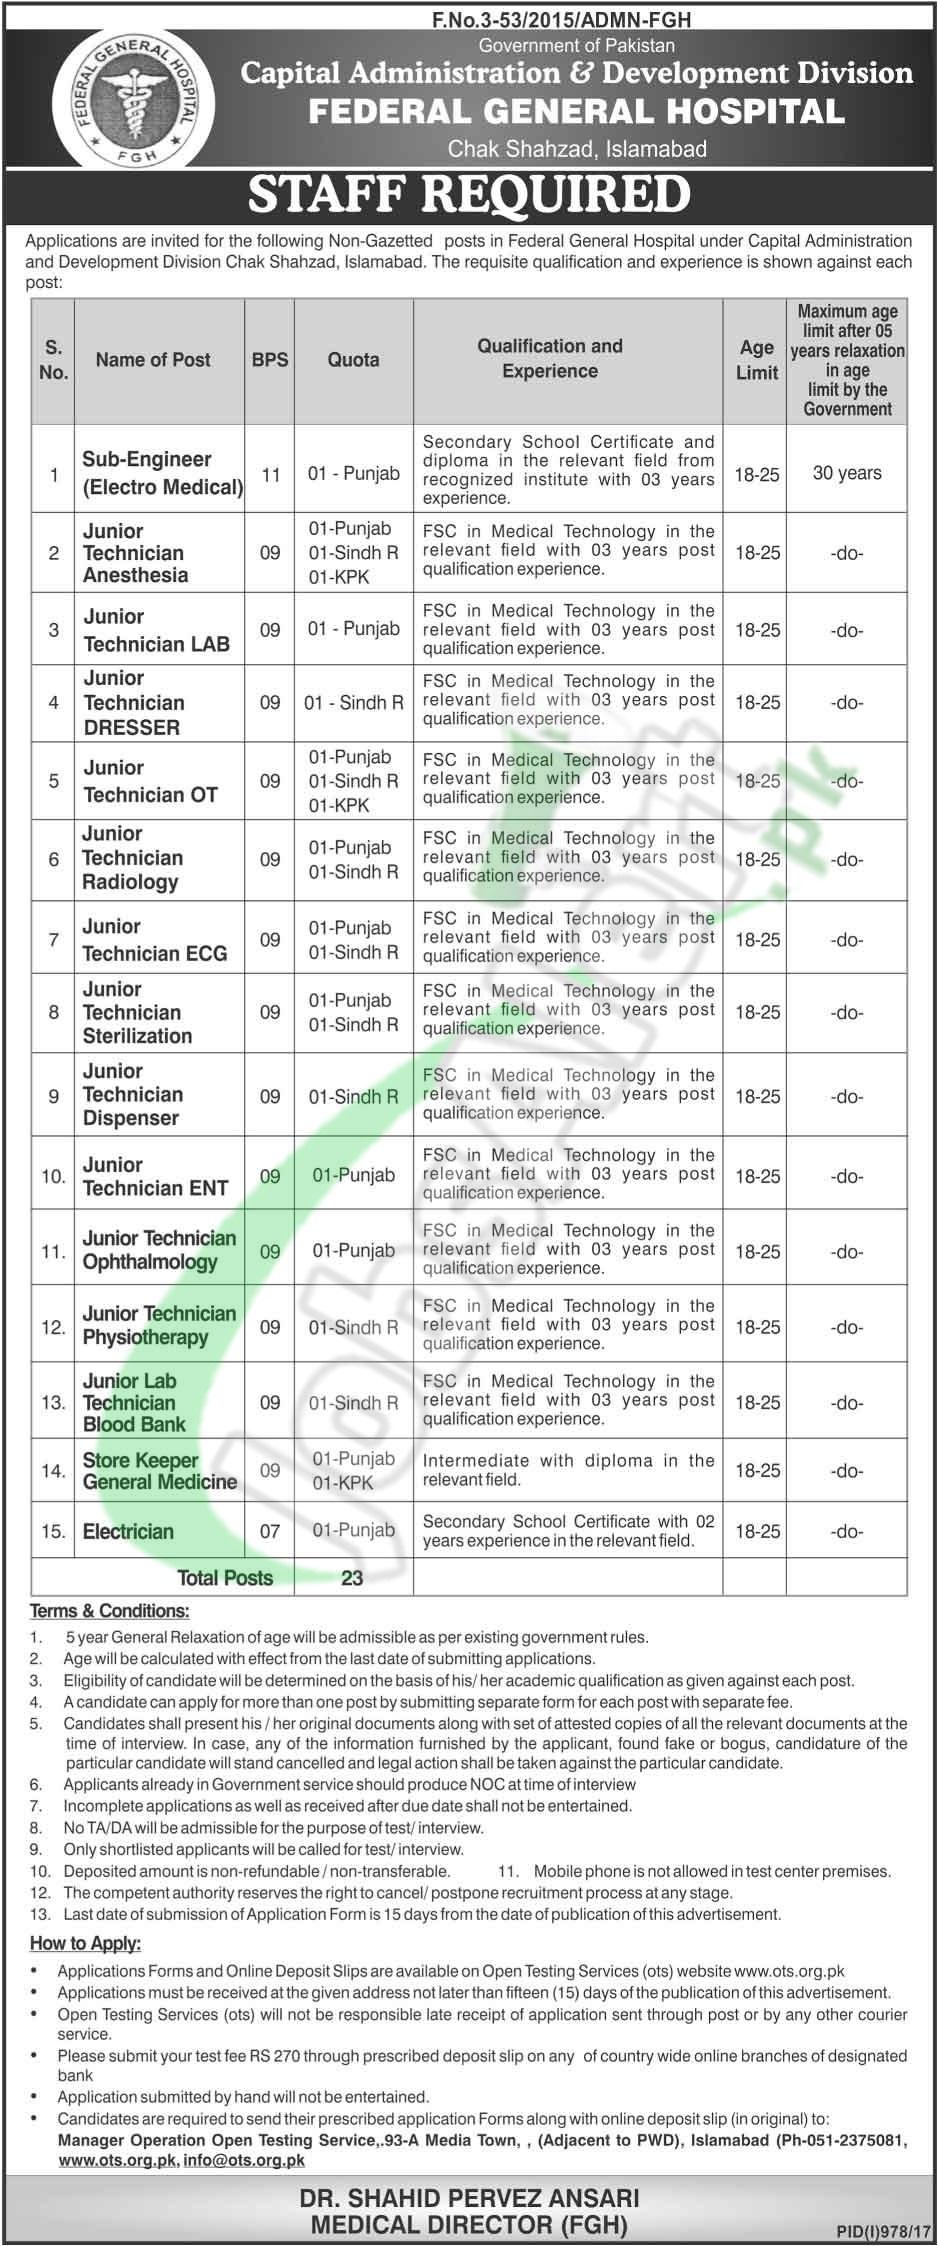 Federal General Hospital Chak Shahzad Islamabad Jobs